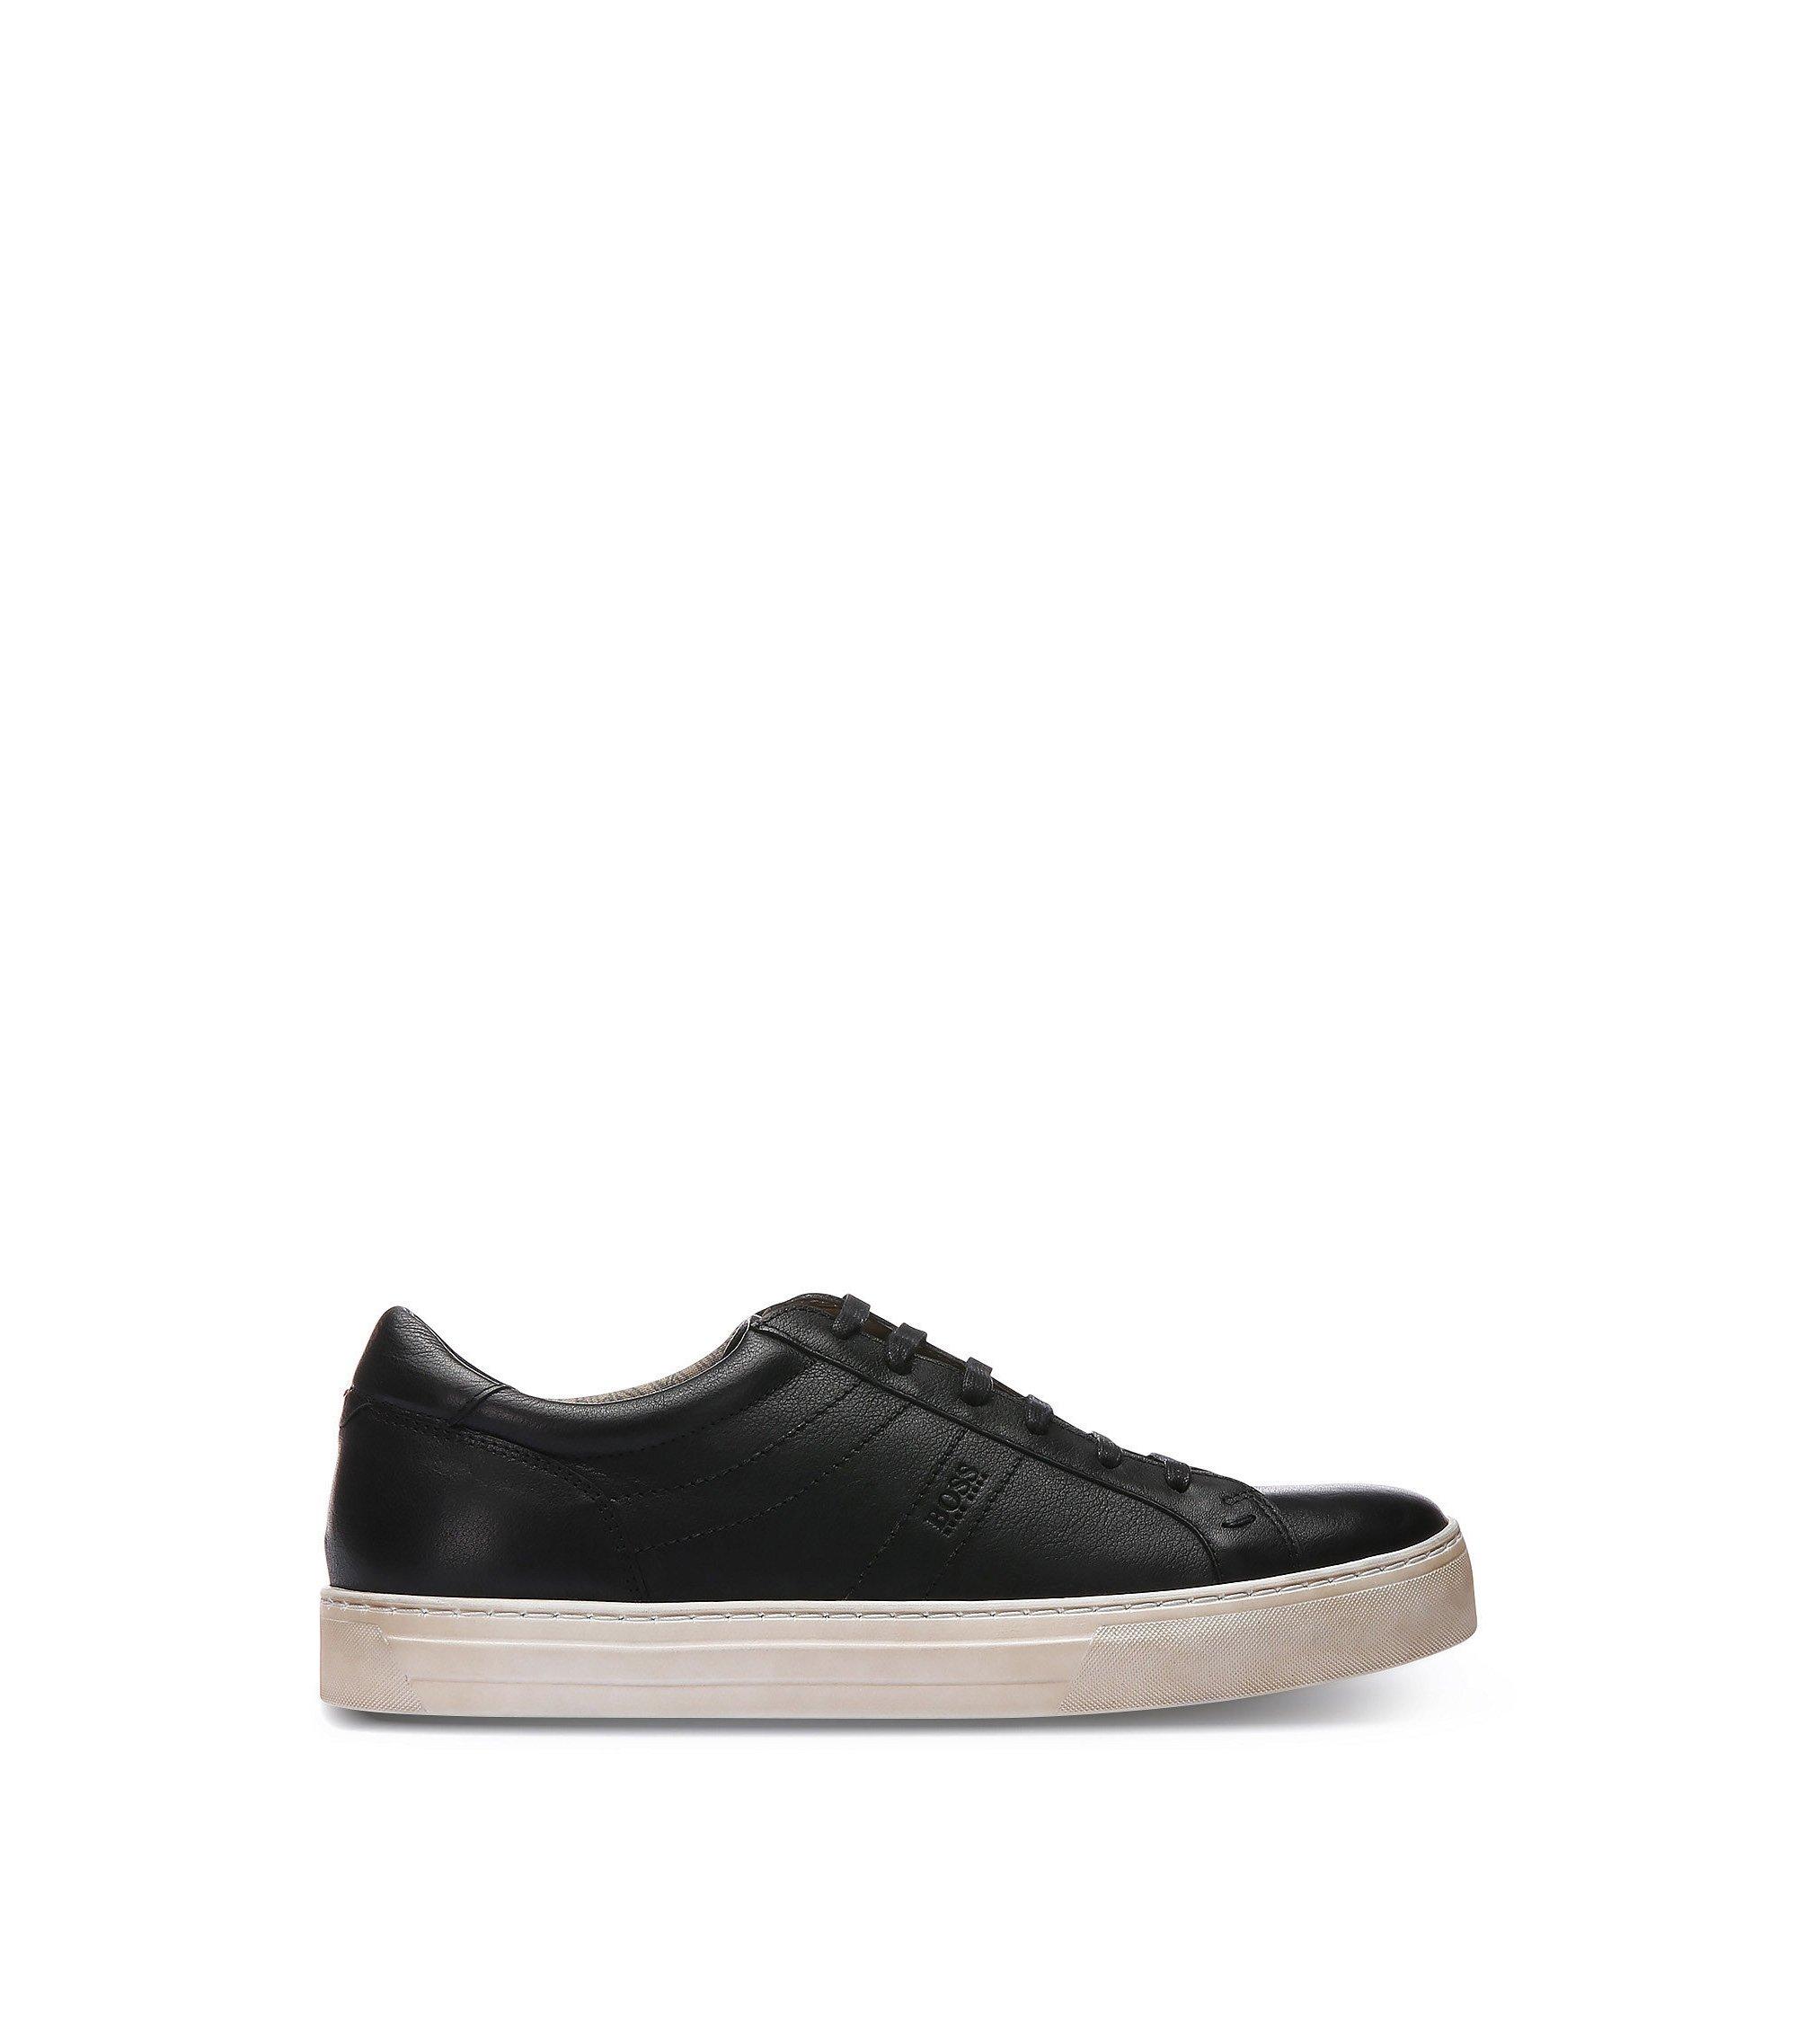 Calfskin Vintage Sneaker | Noir Tenn Itws, Black